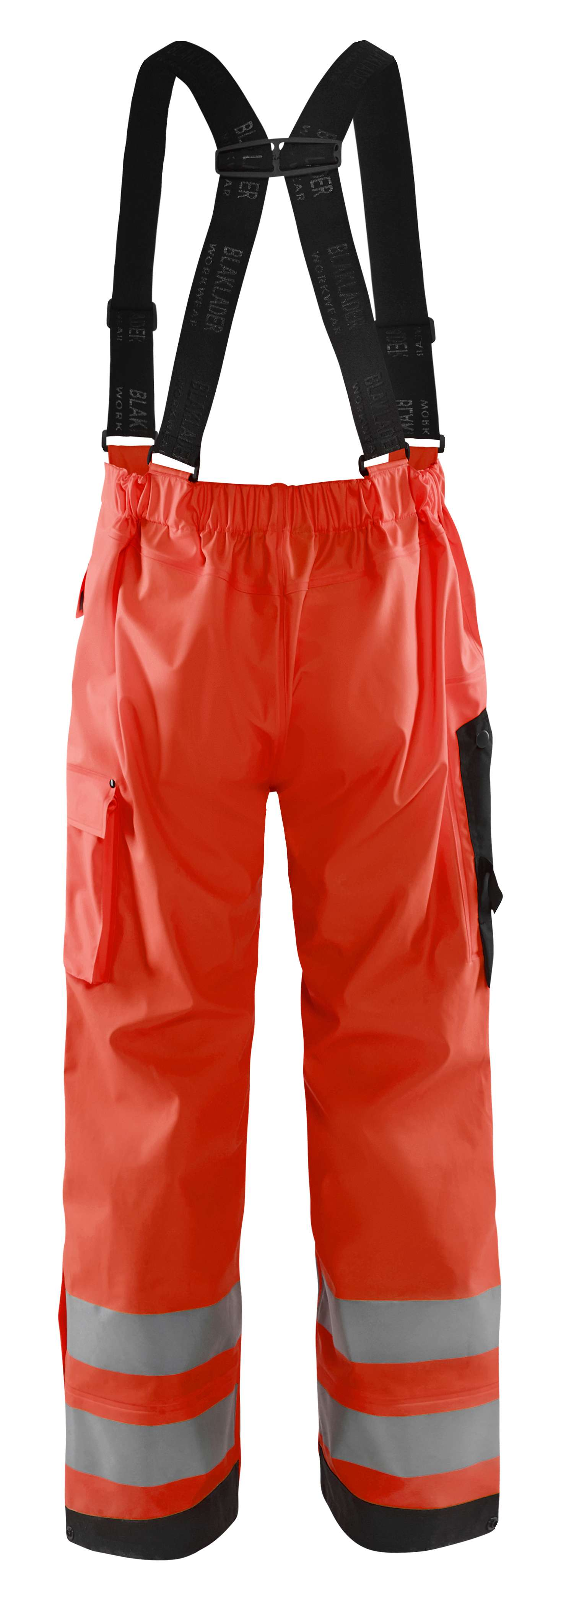 Blaklader Regenbroeken 13022003 High Vis fluor rood(5500)